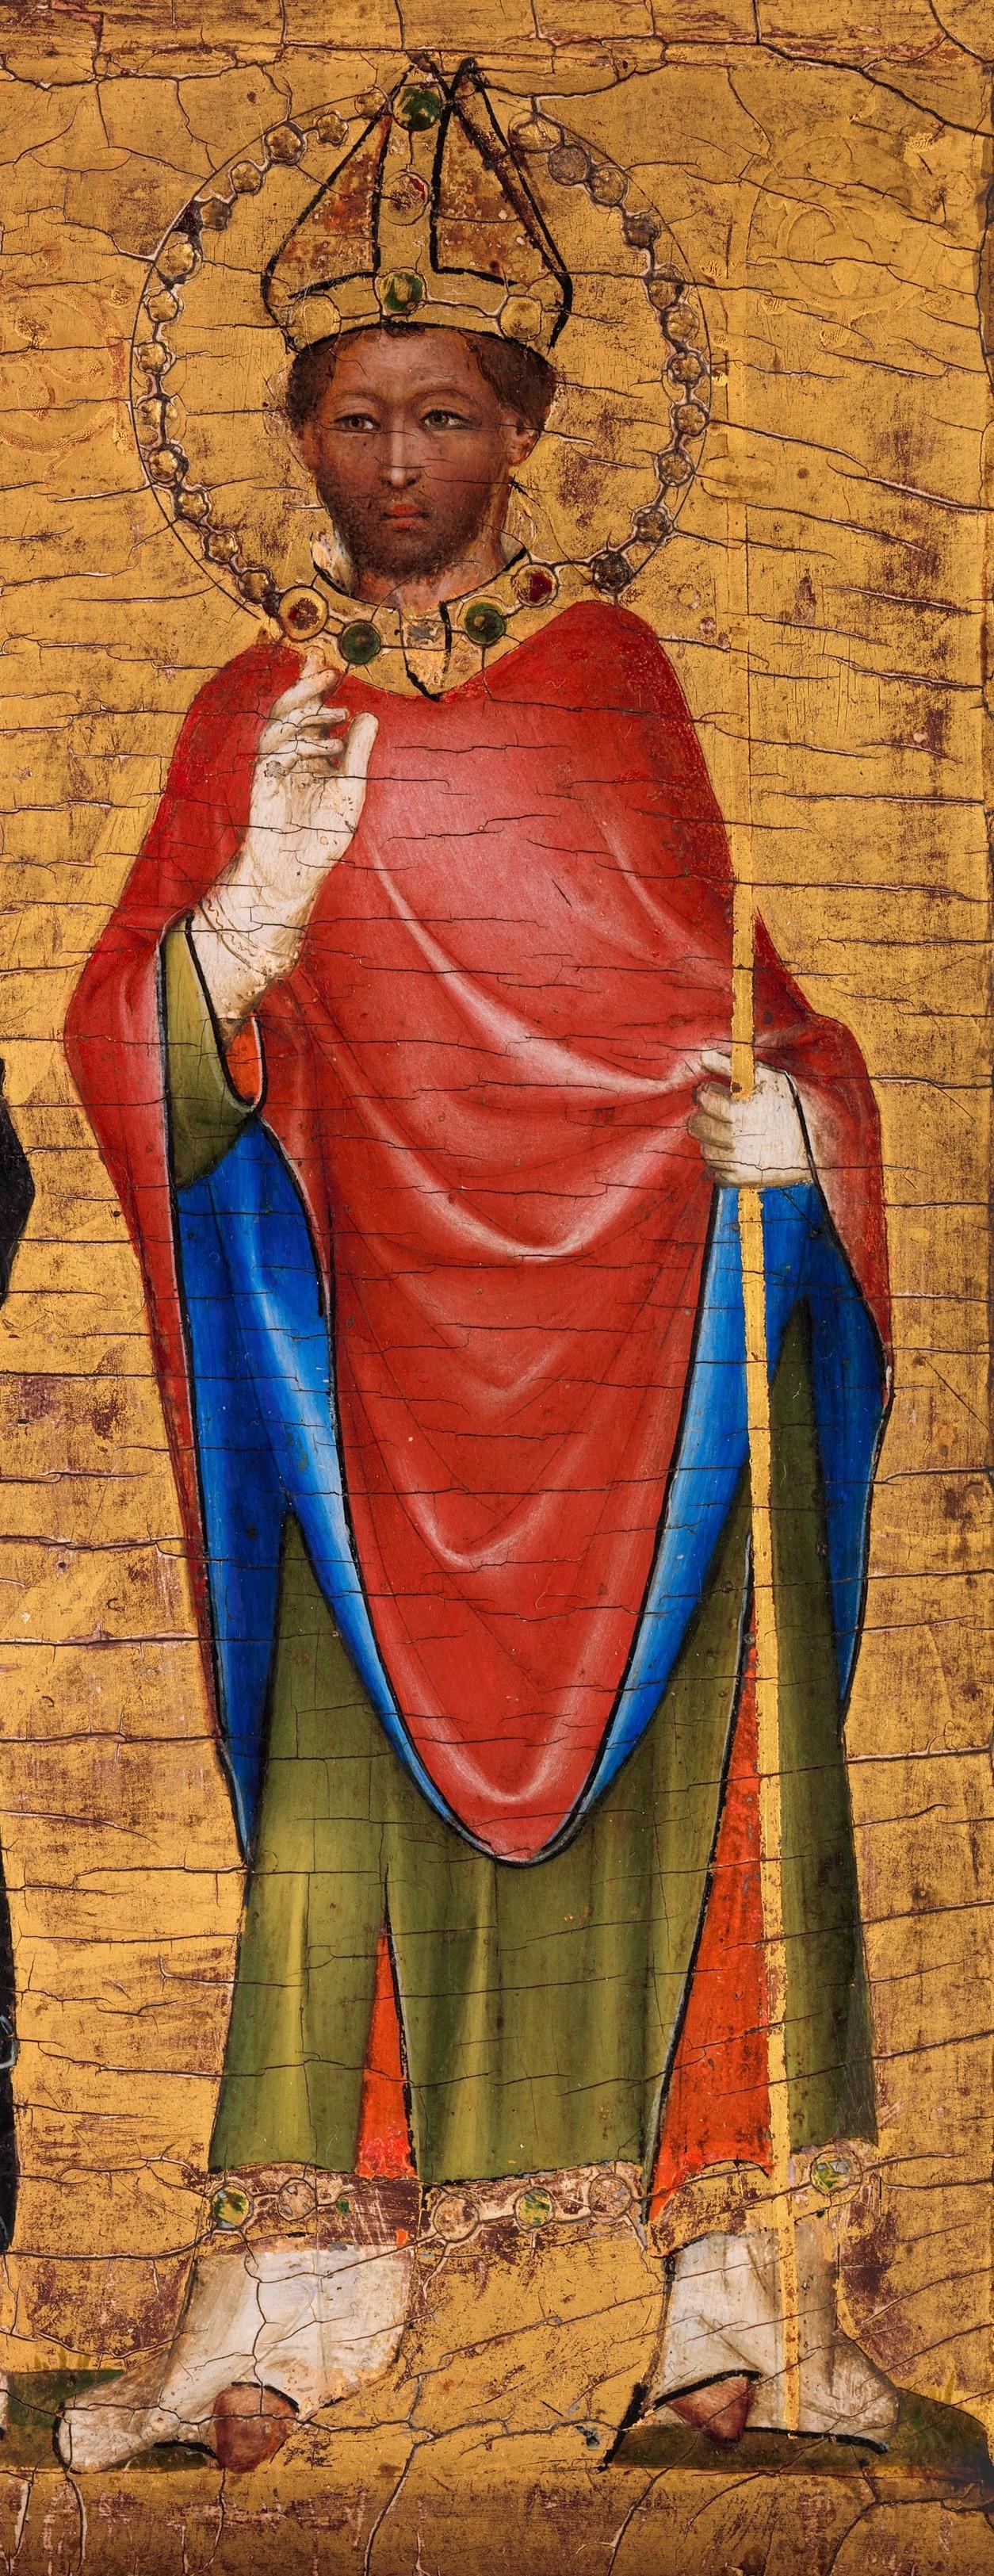 Ausschnitt eines privaten Andachtbilds, um 1345, Metropolitan Museum of Art, New York